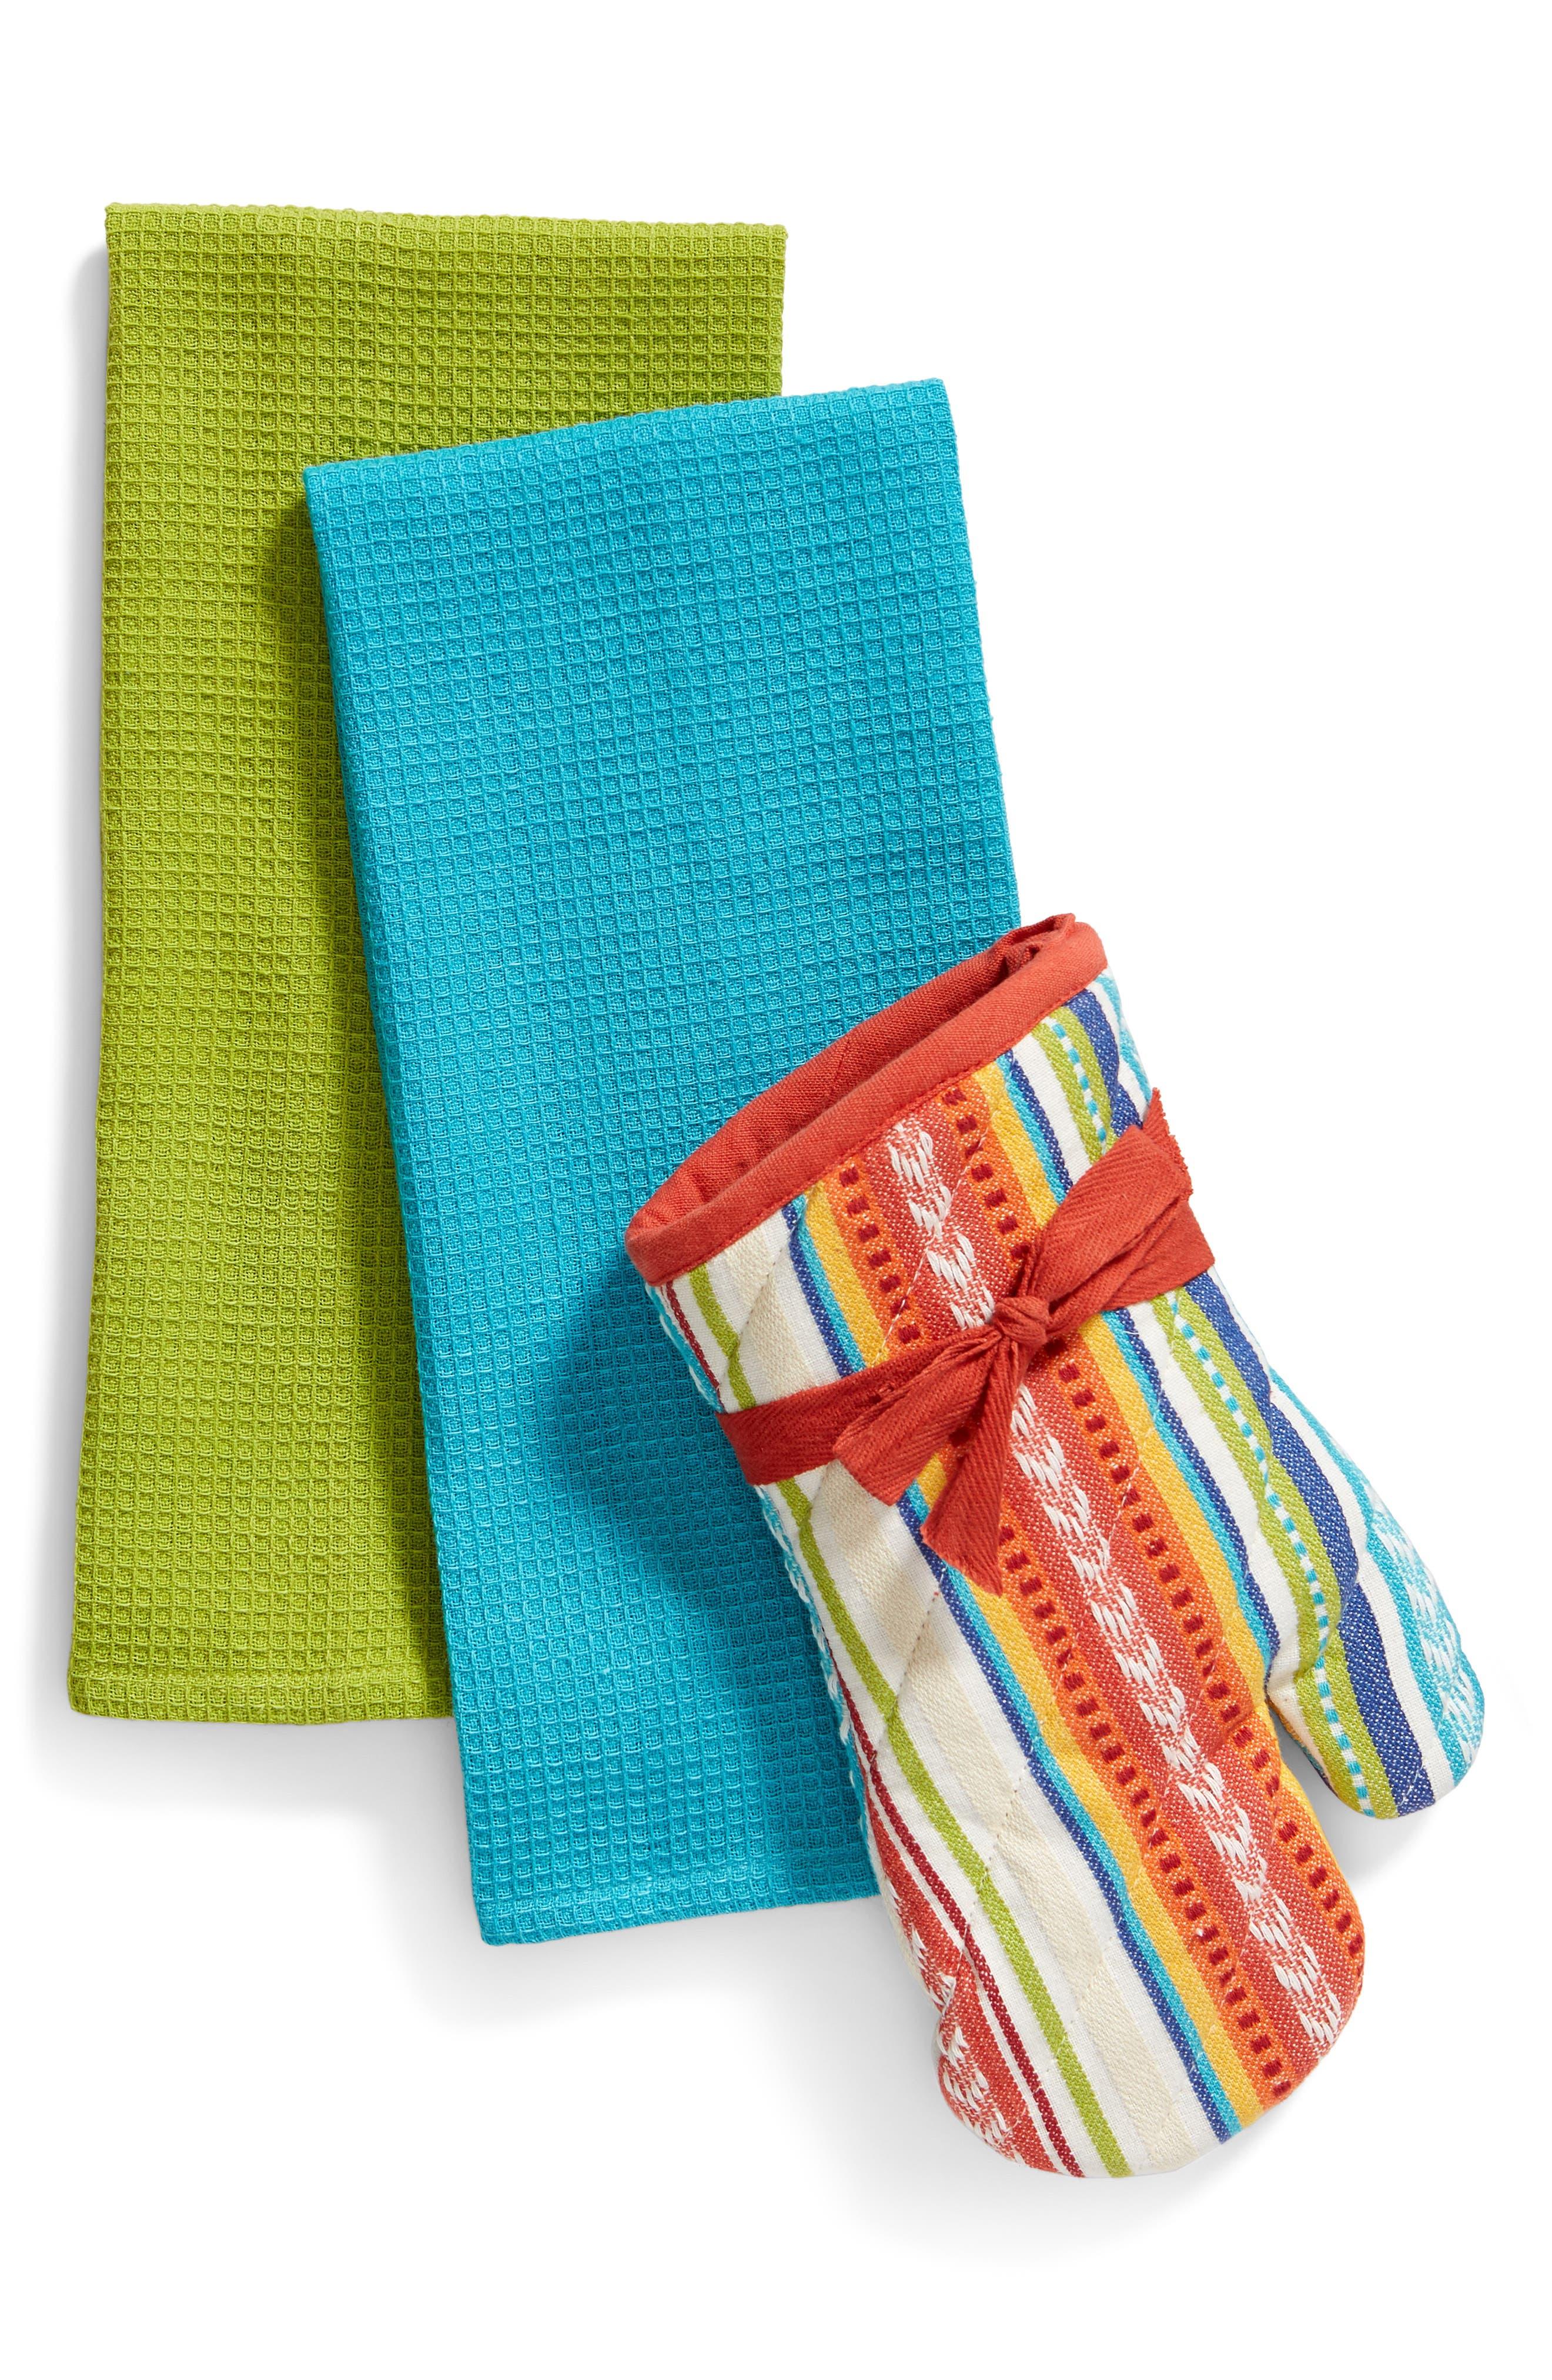 Baja Cantina Oven Mitt & Towel Set,                         Main,                         color, 100